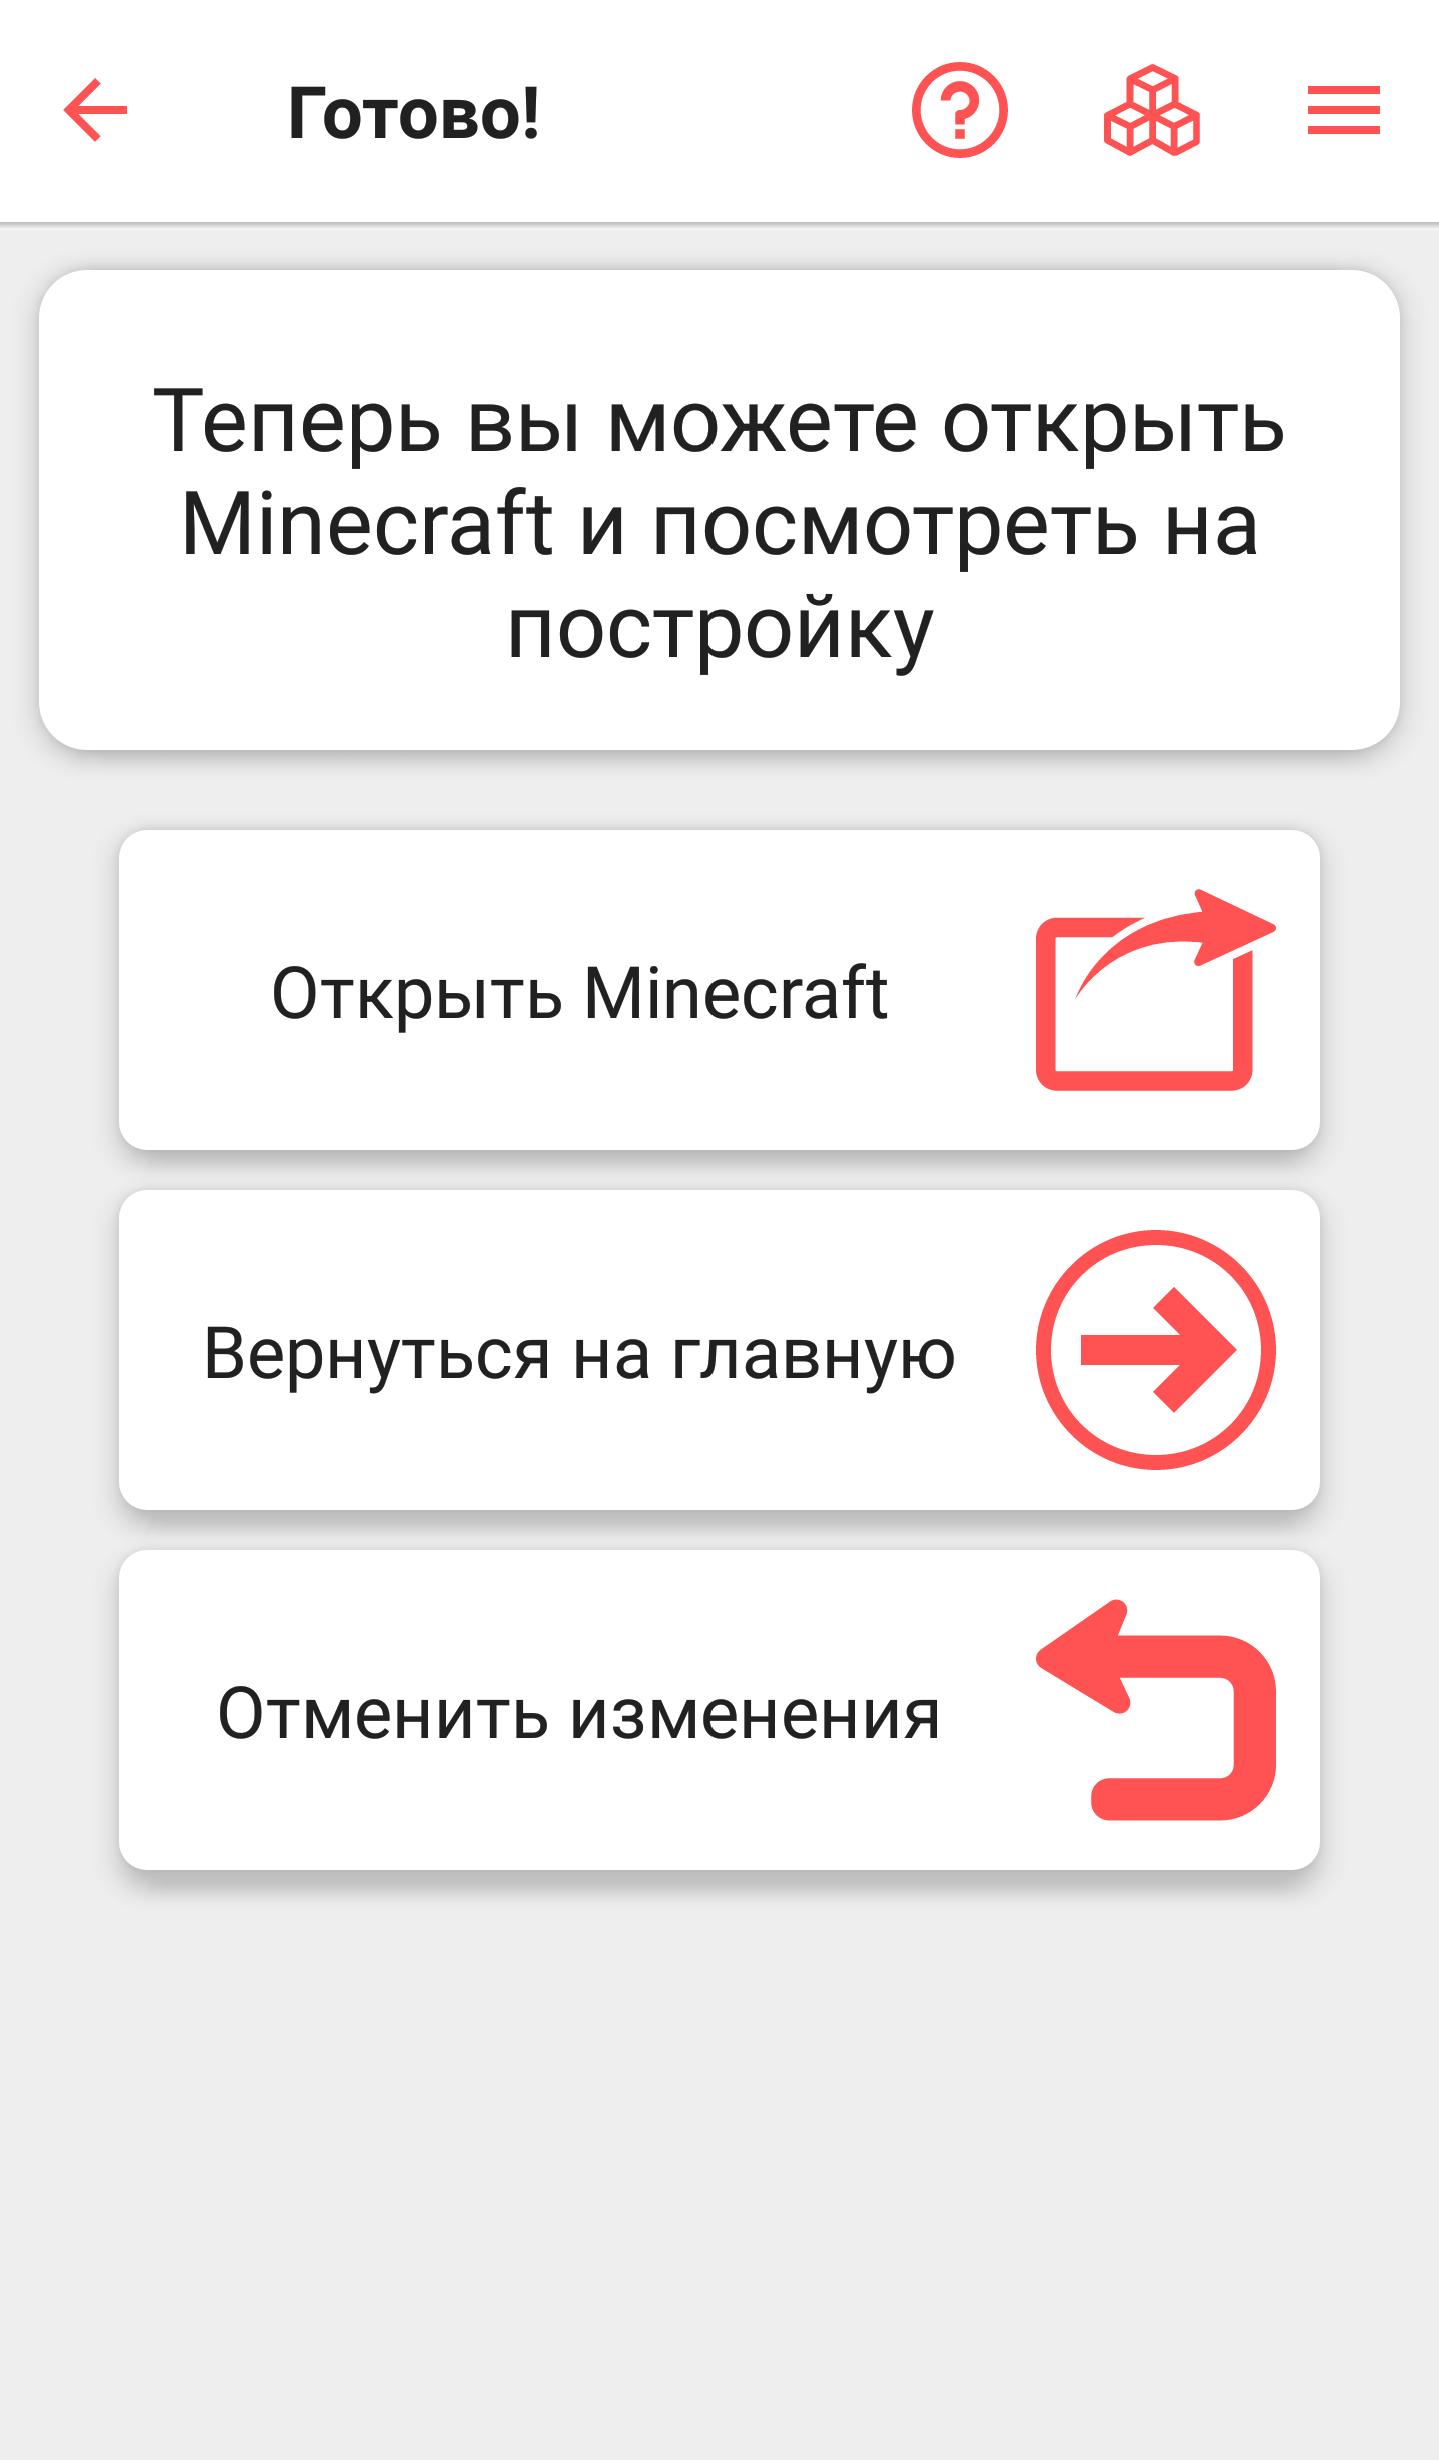 20170118_154235